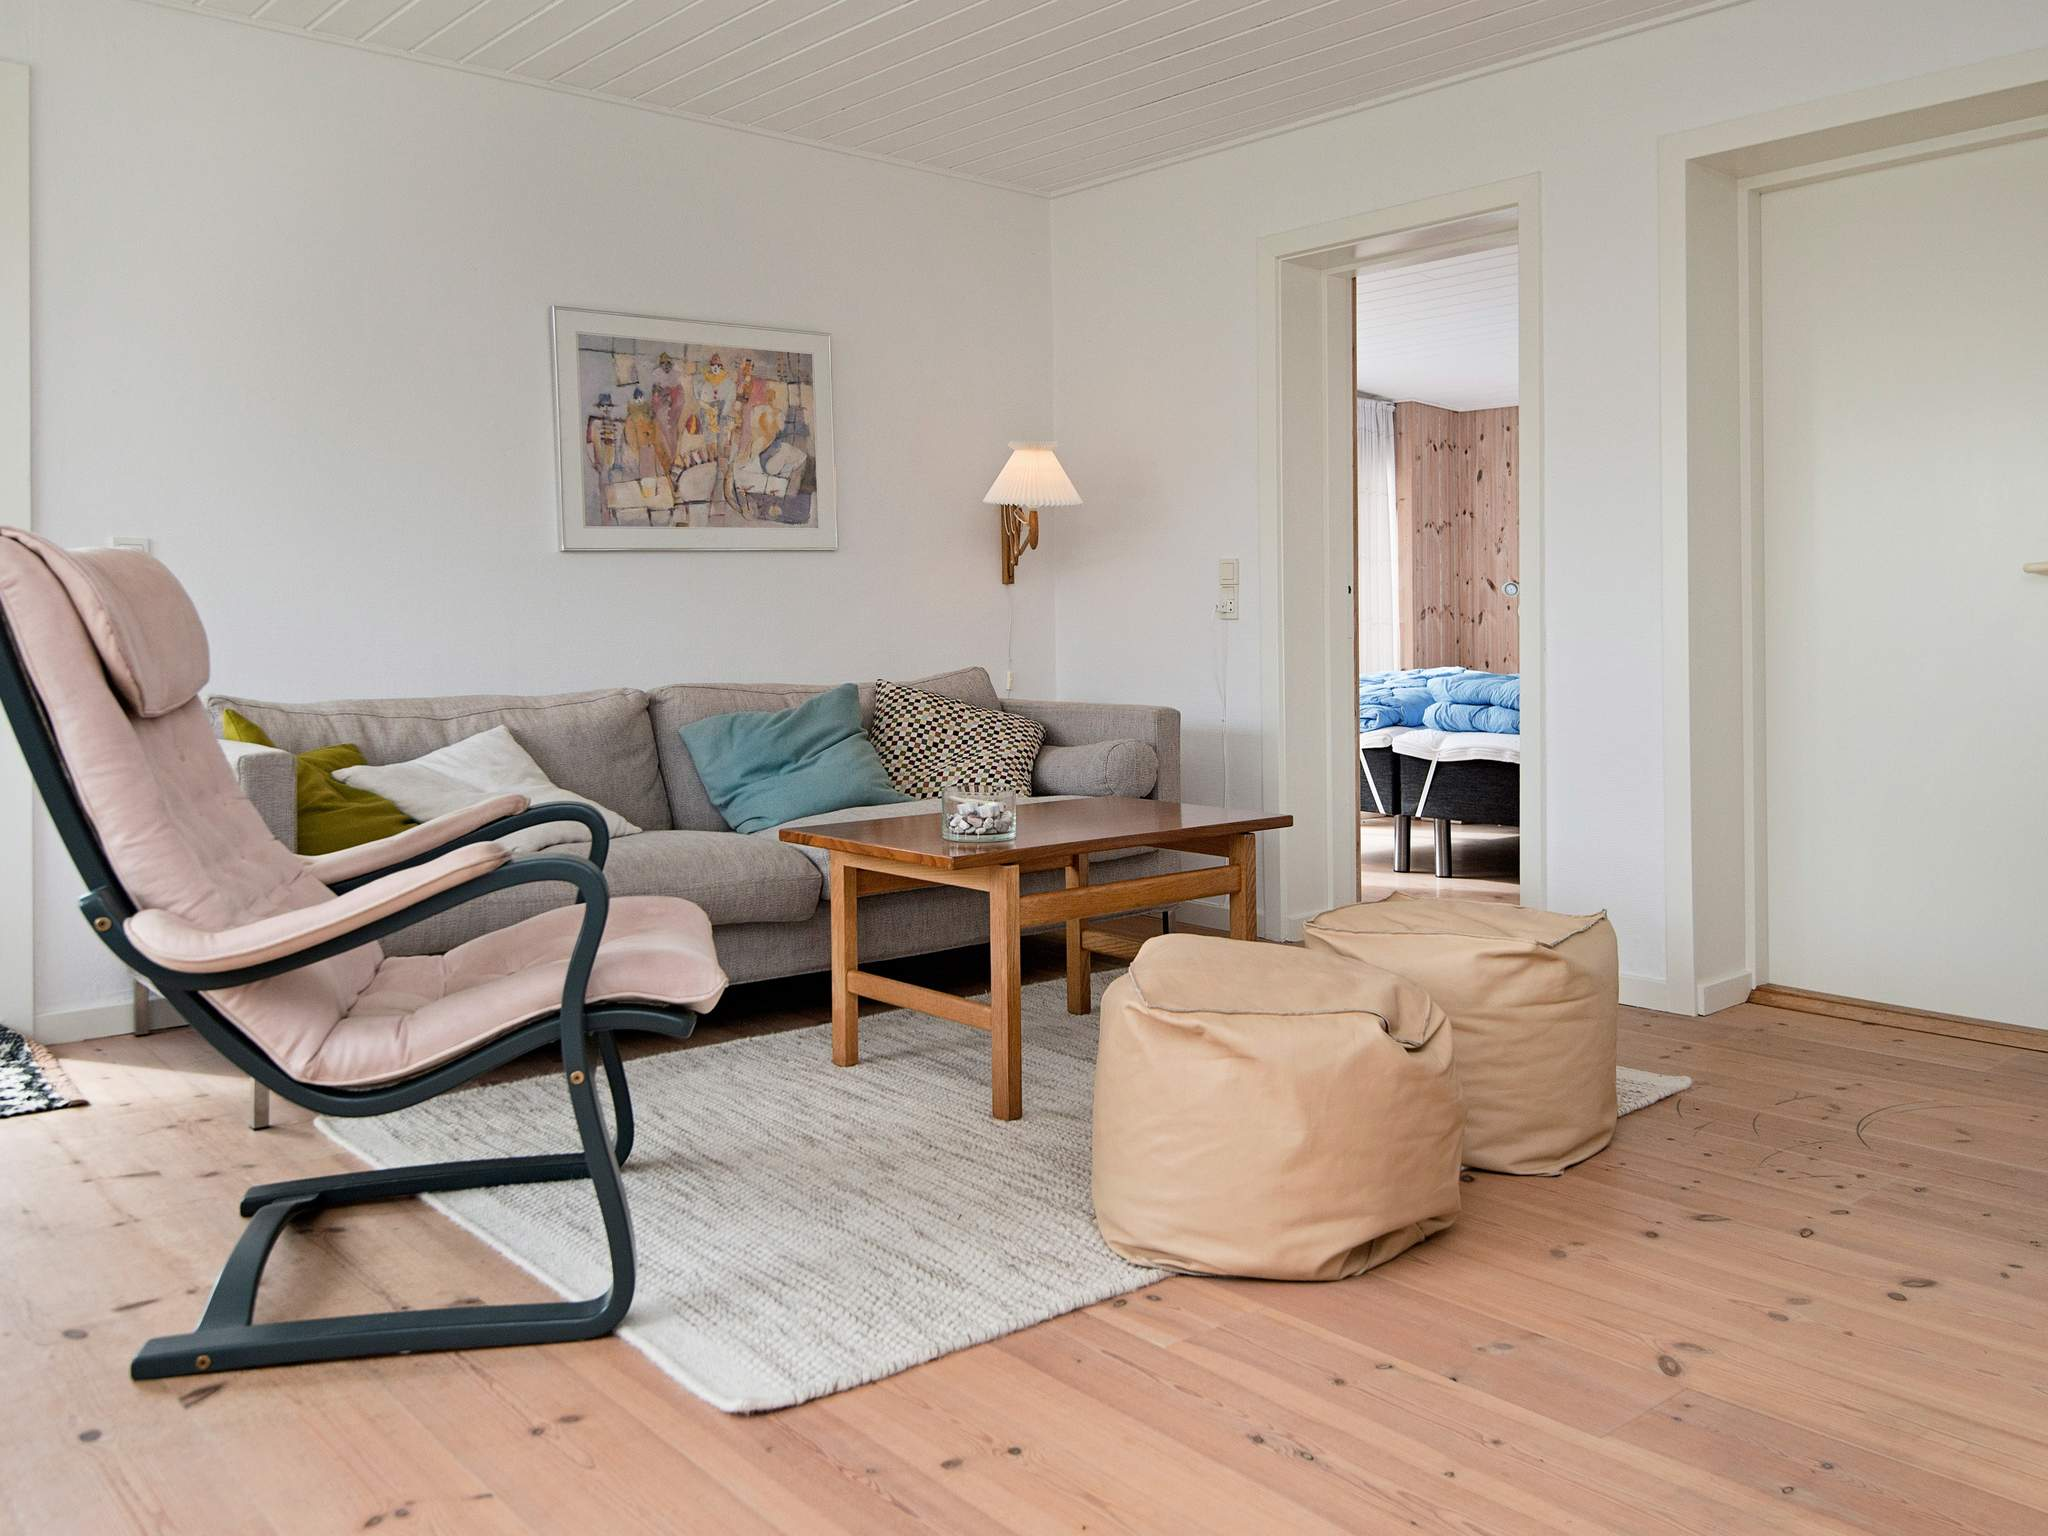 Ferienhaus Ajstrup Strand/Malling (2355032), Ajstrup, , Ostjütland, Dänemark, Bild 5